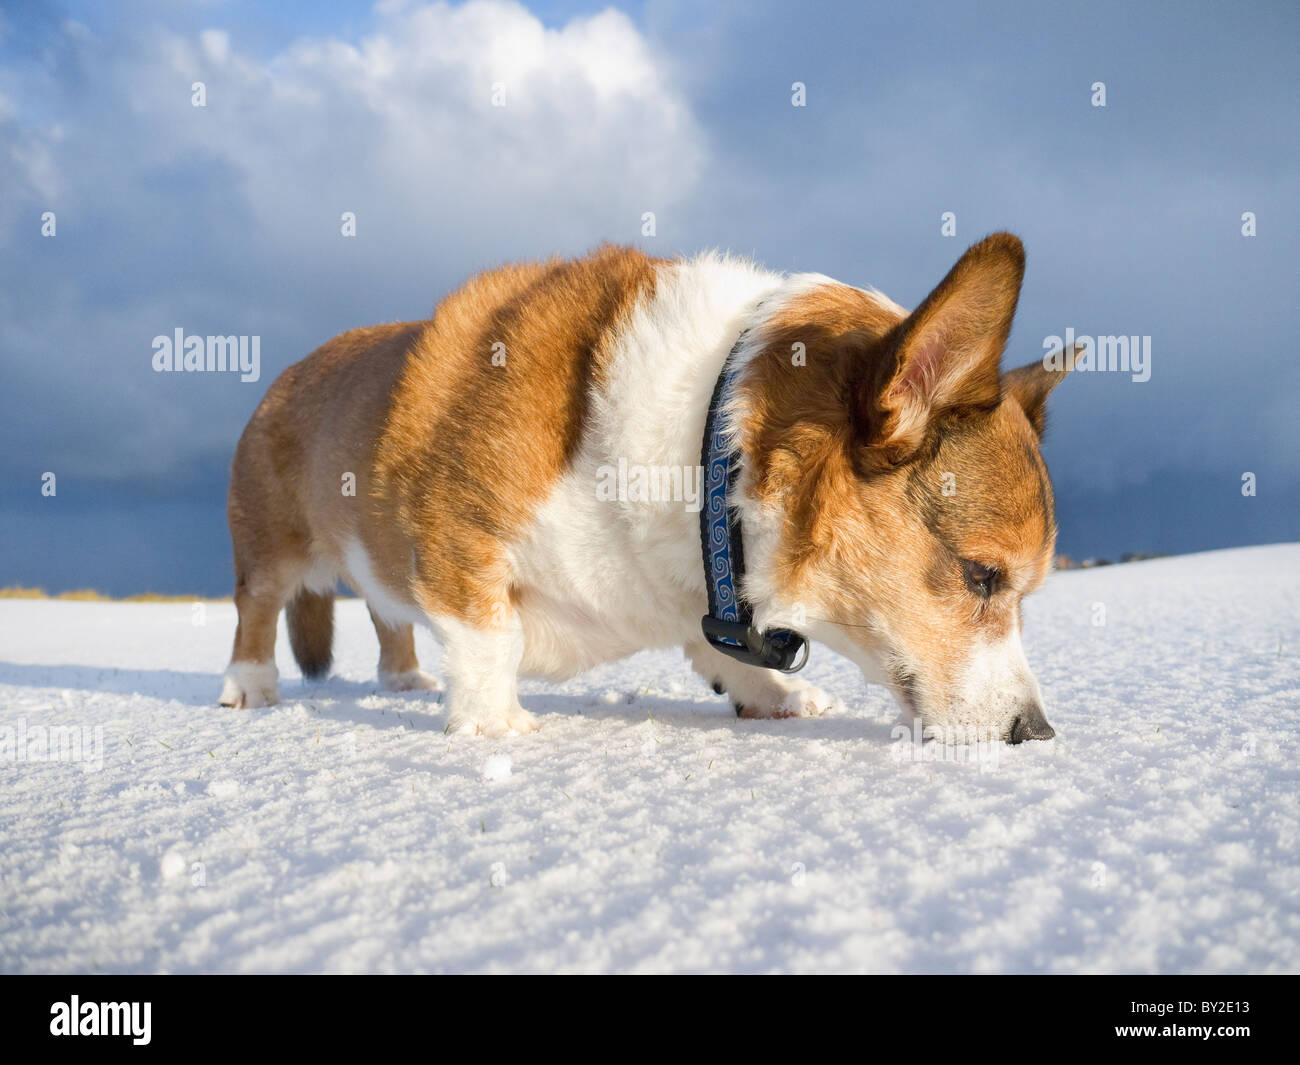 A male cardigan corgi (dog) in the snow in Scotland. - Stock Image